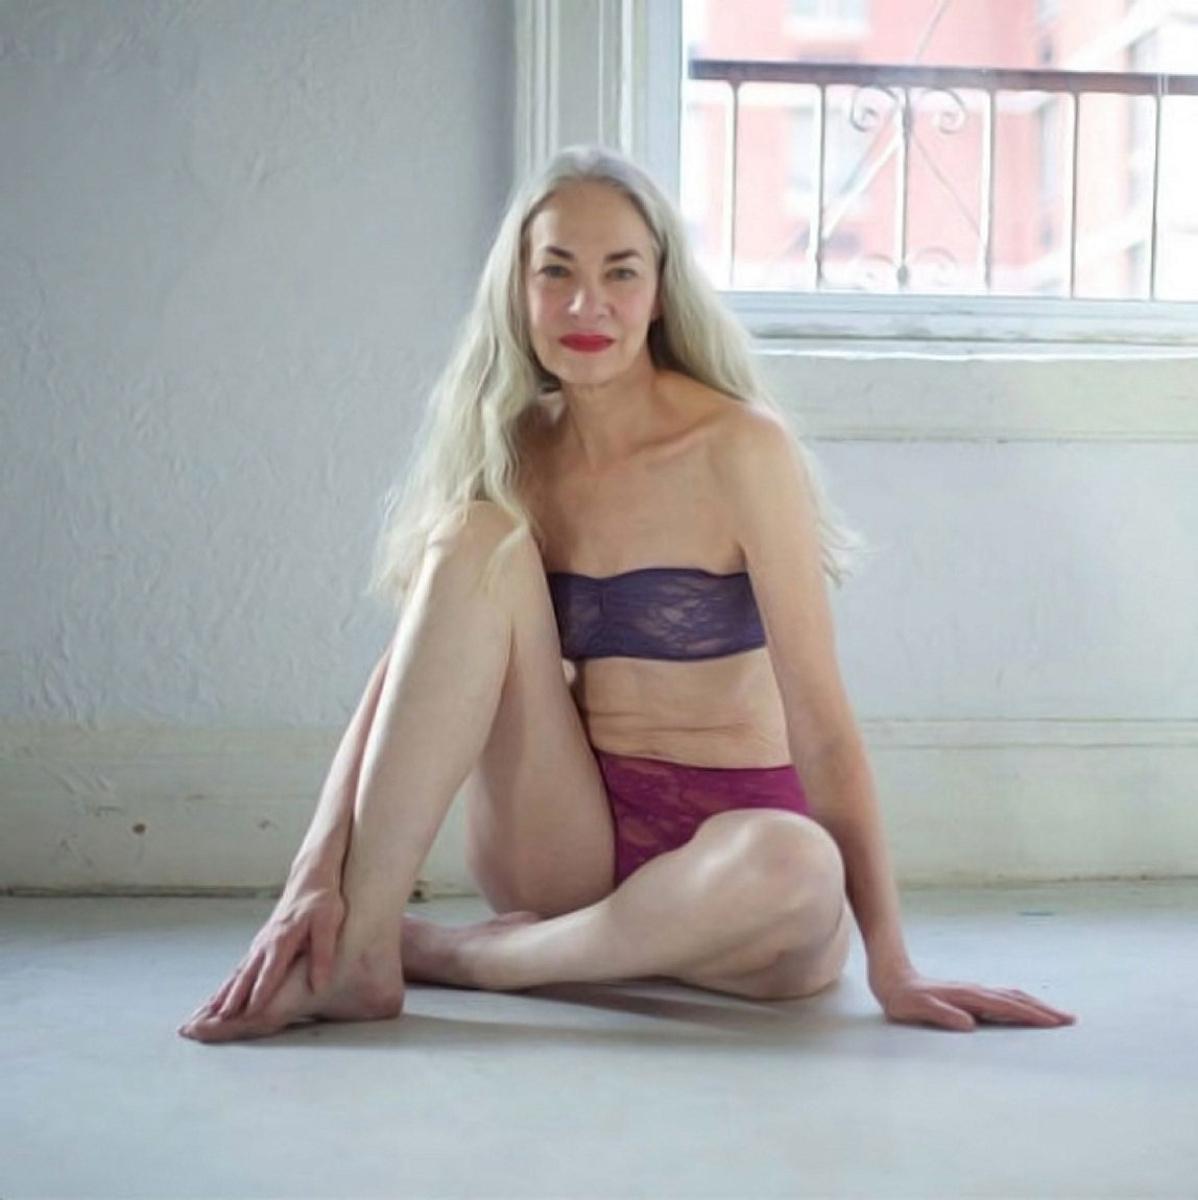 Pornstar Nicole Ray strips off retro clothes to model nude in granny boots № 527523  скачать